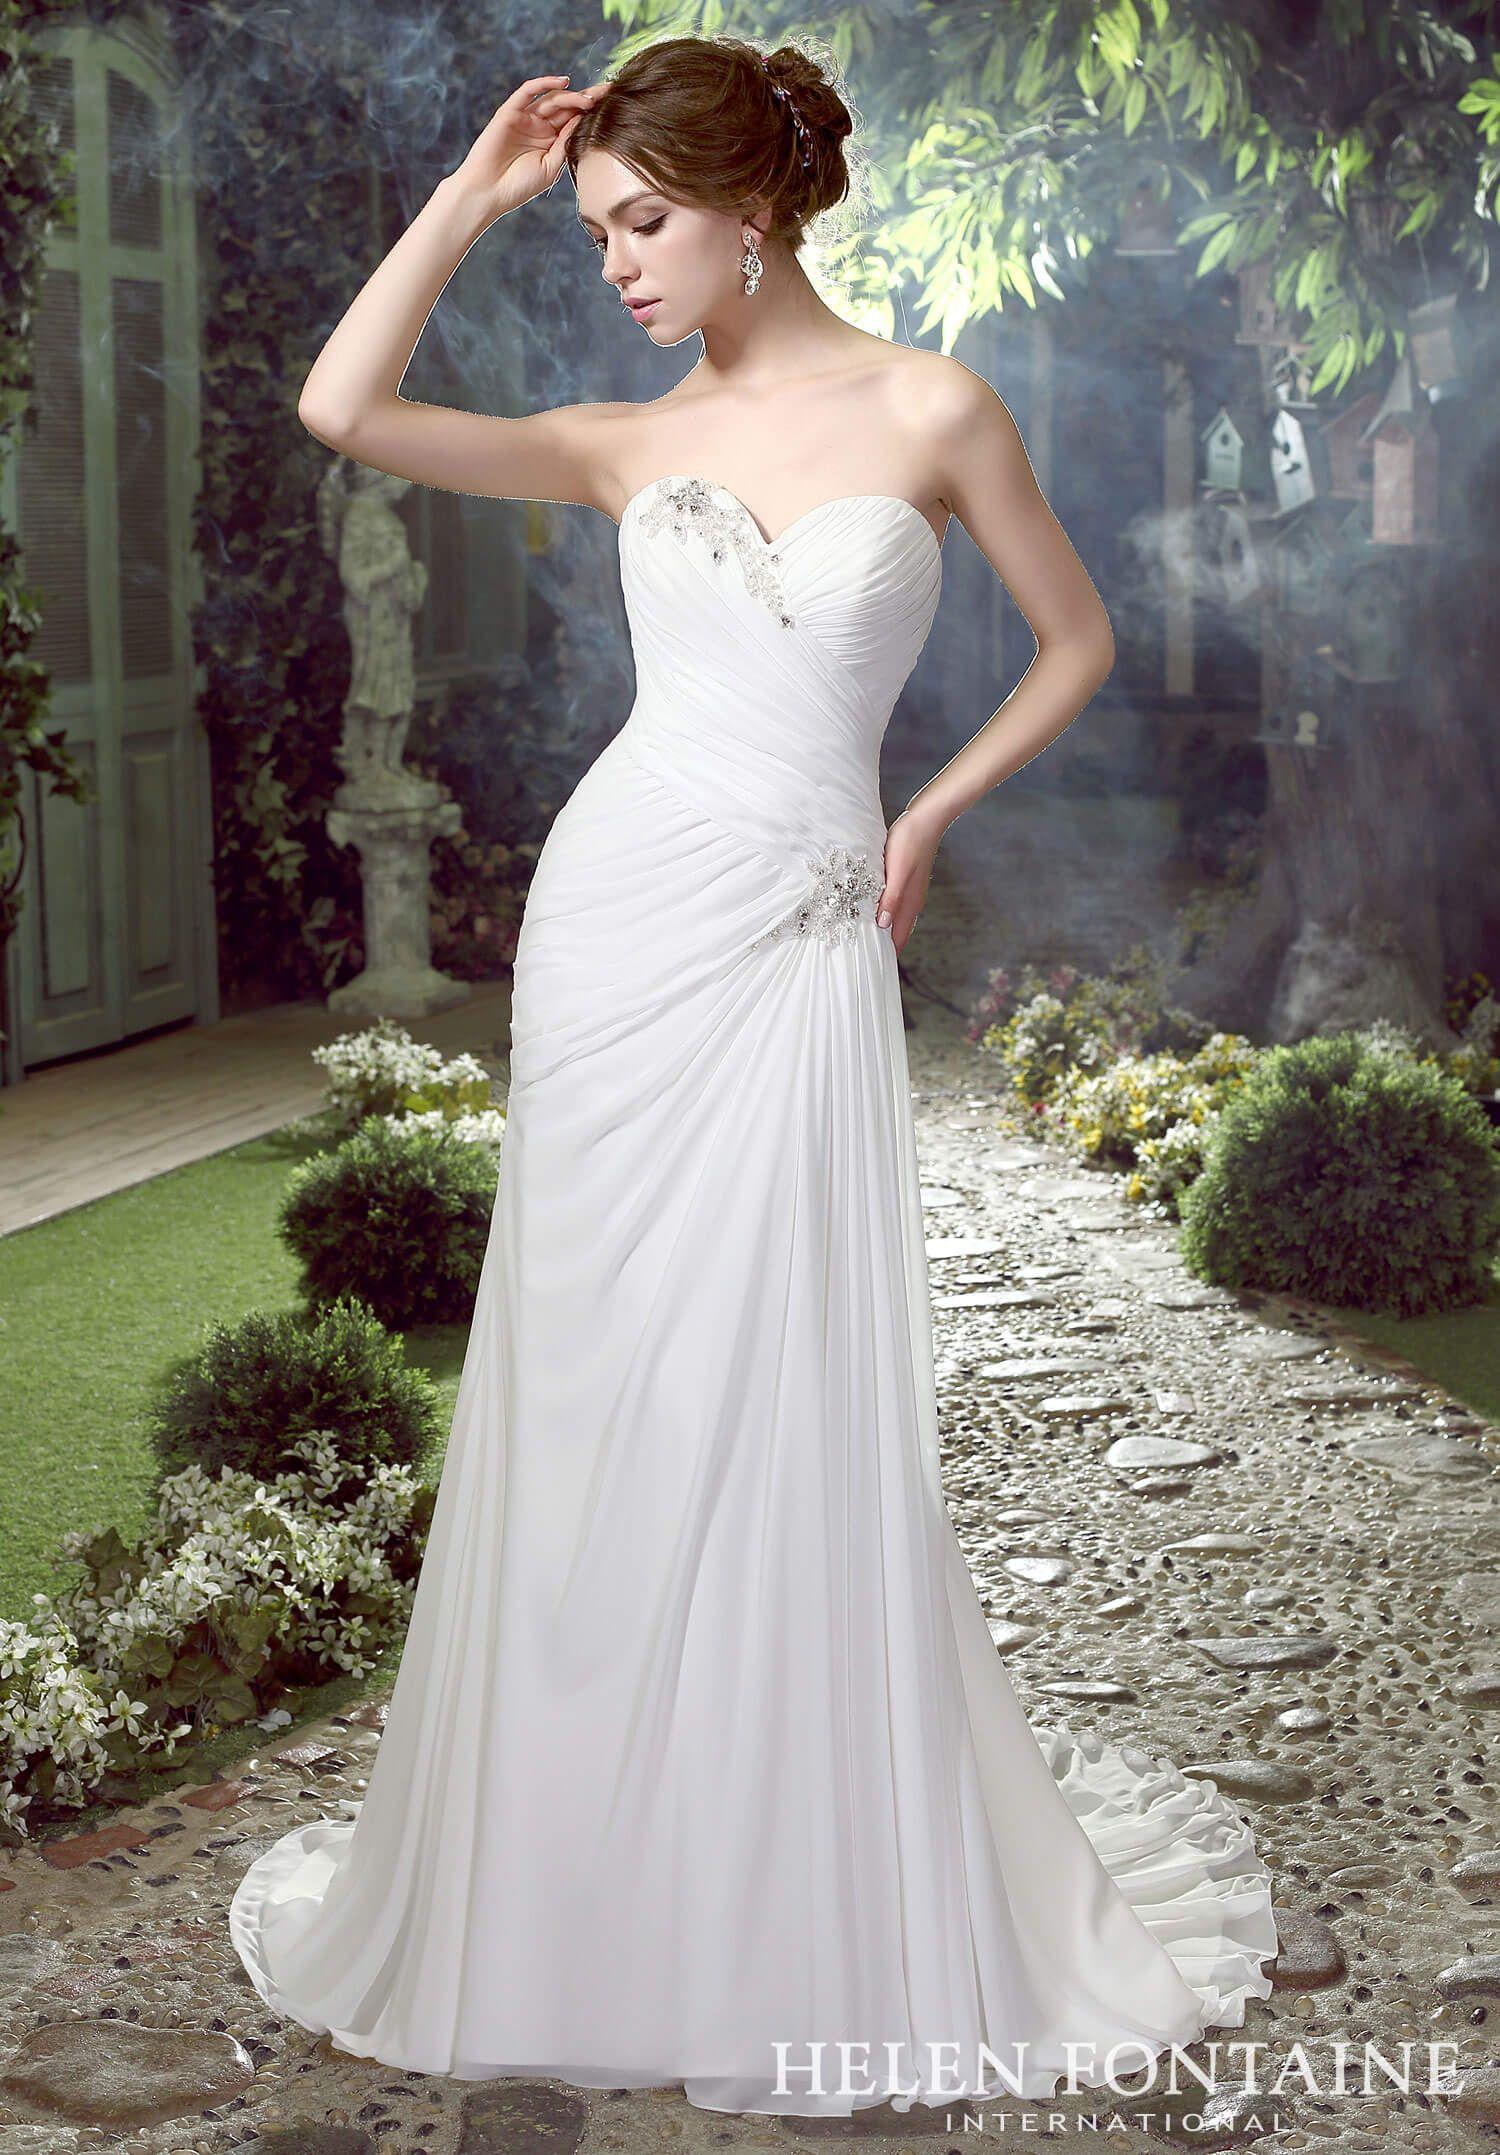 Helen Fontaine Style 1035 in 2020 Informal wedding